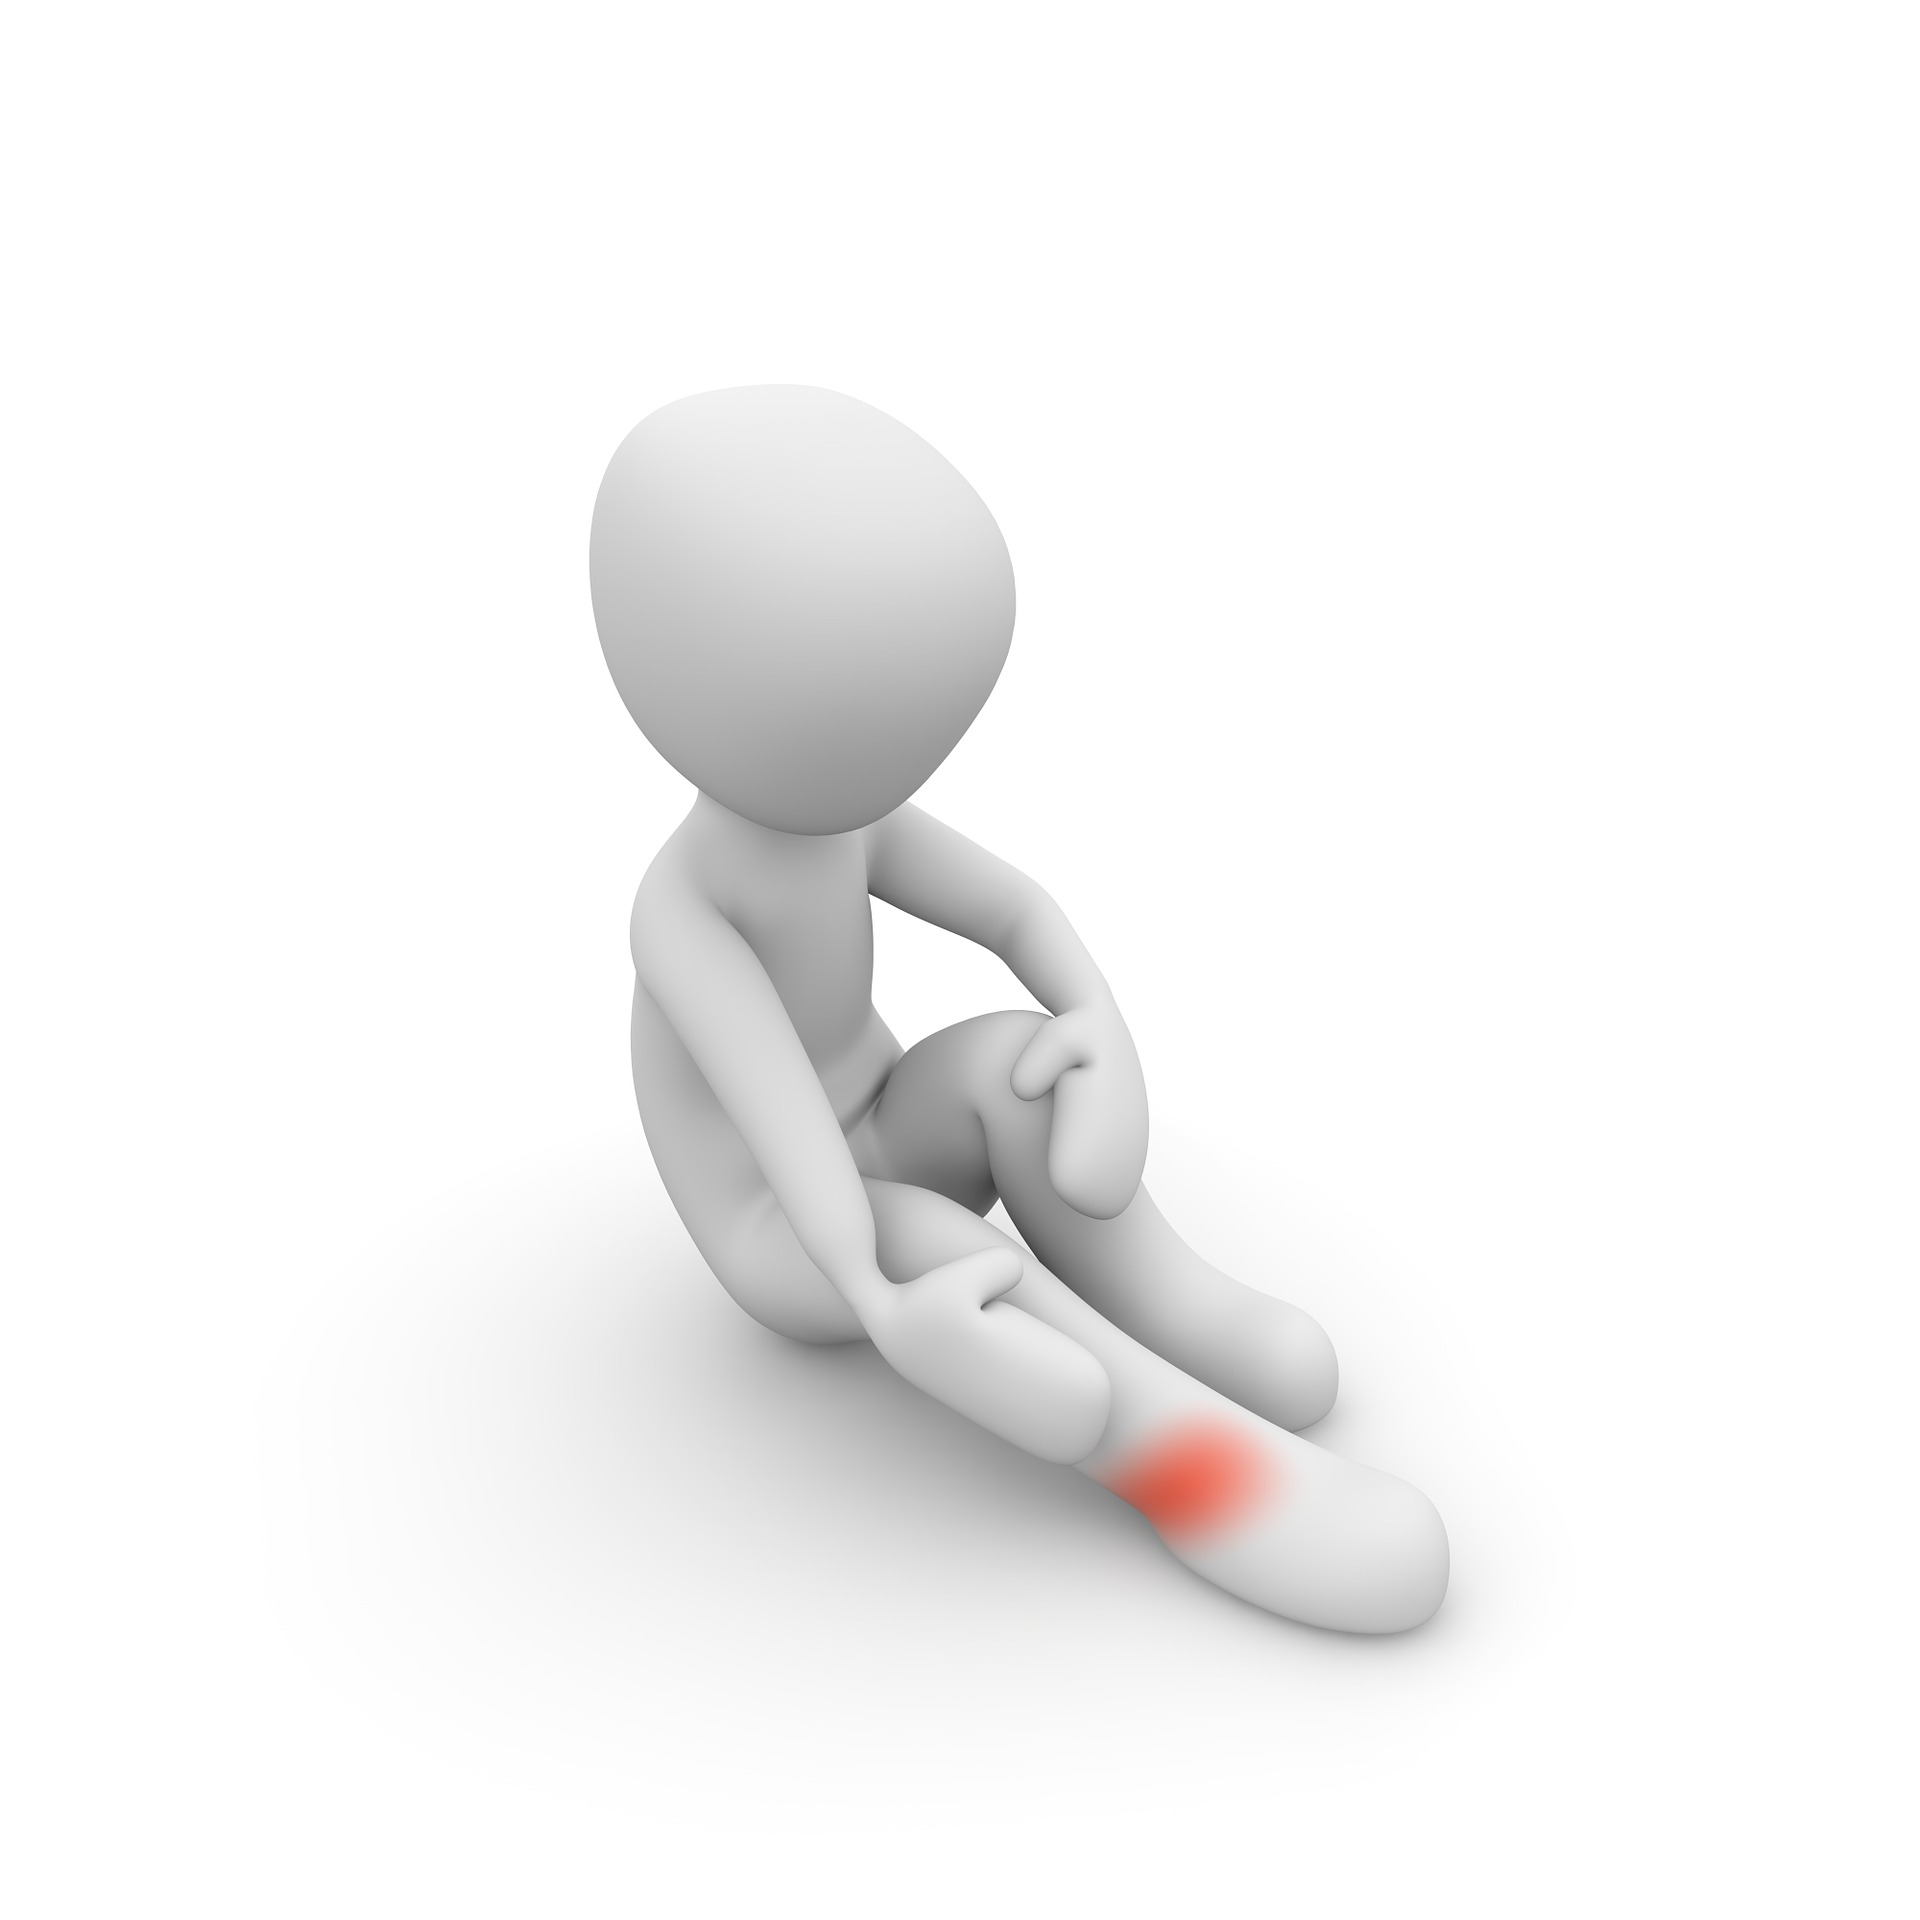 pain-1015576_1920